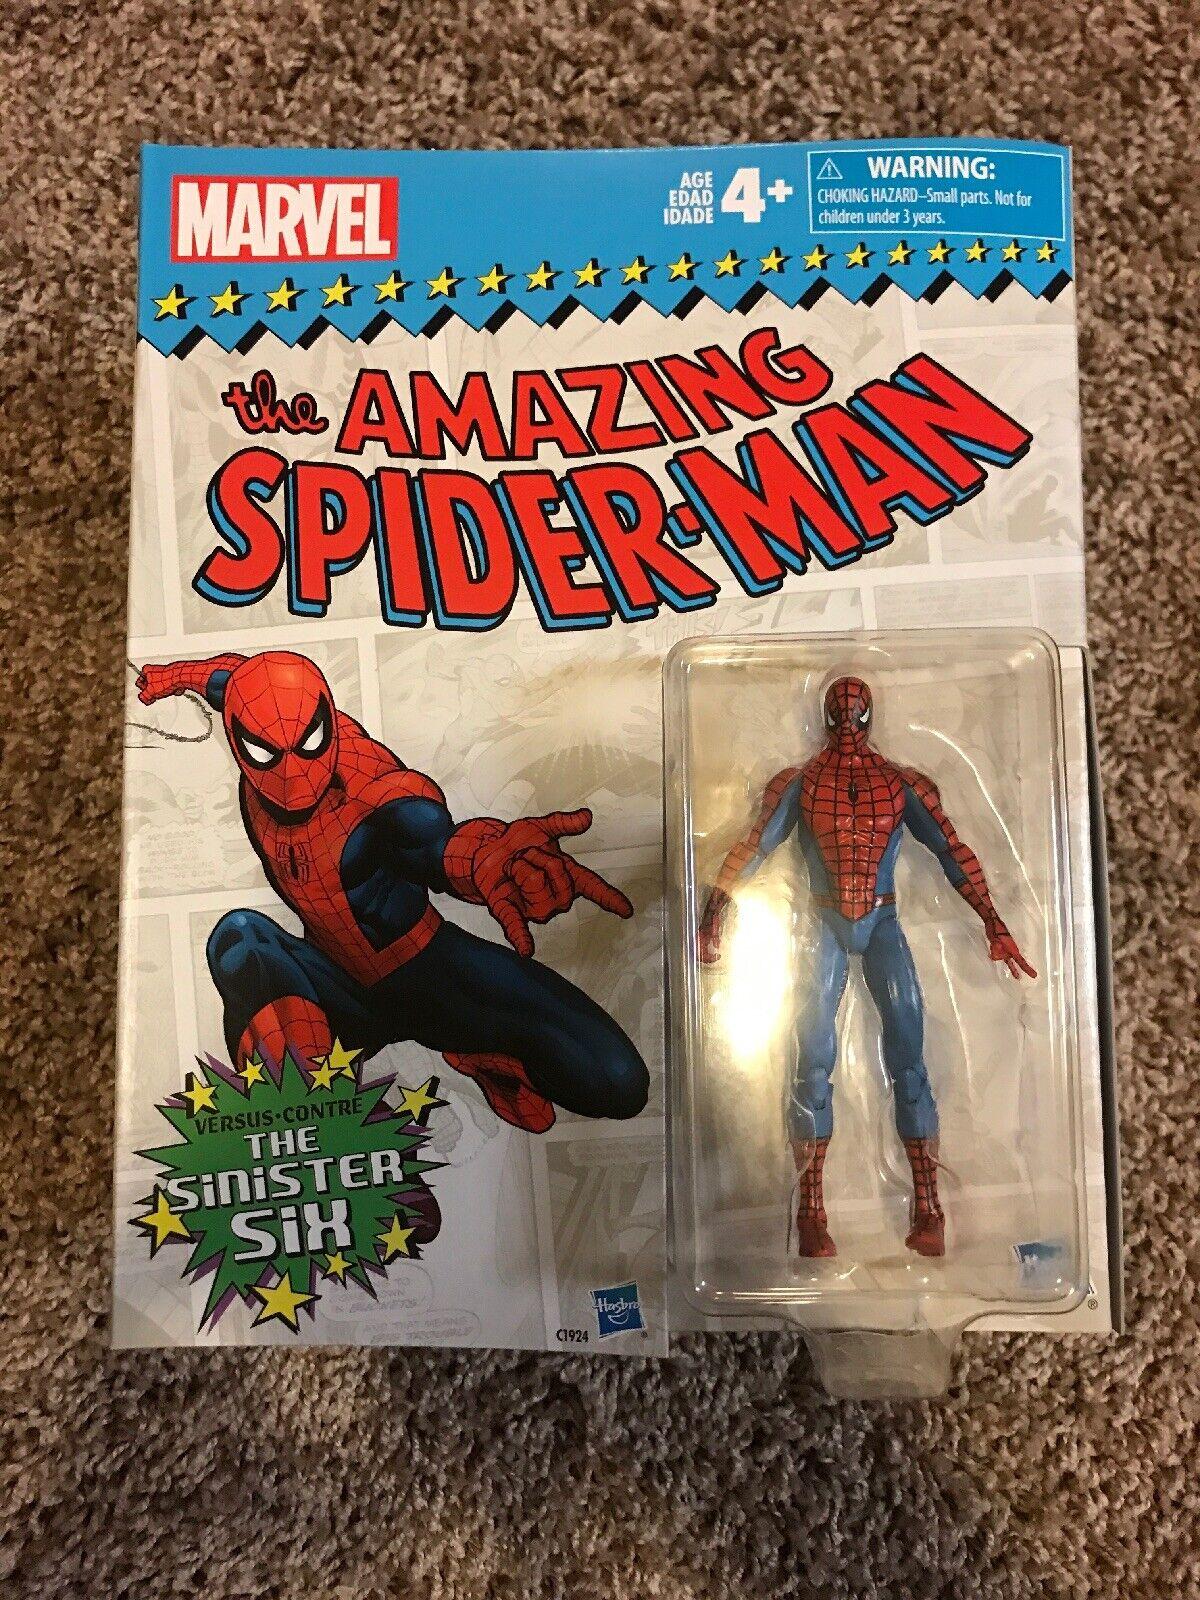 MARVEL LEGENDS 3.75  EXCLUSIVE SPIDER-MAN vs THE SINISTER SIX BOX SET